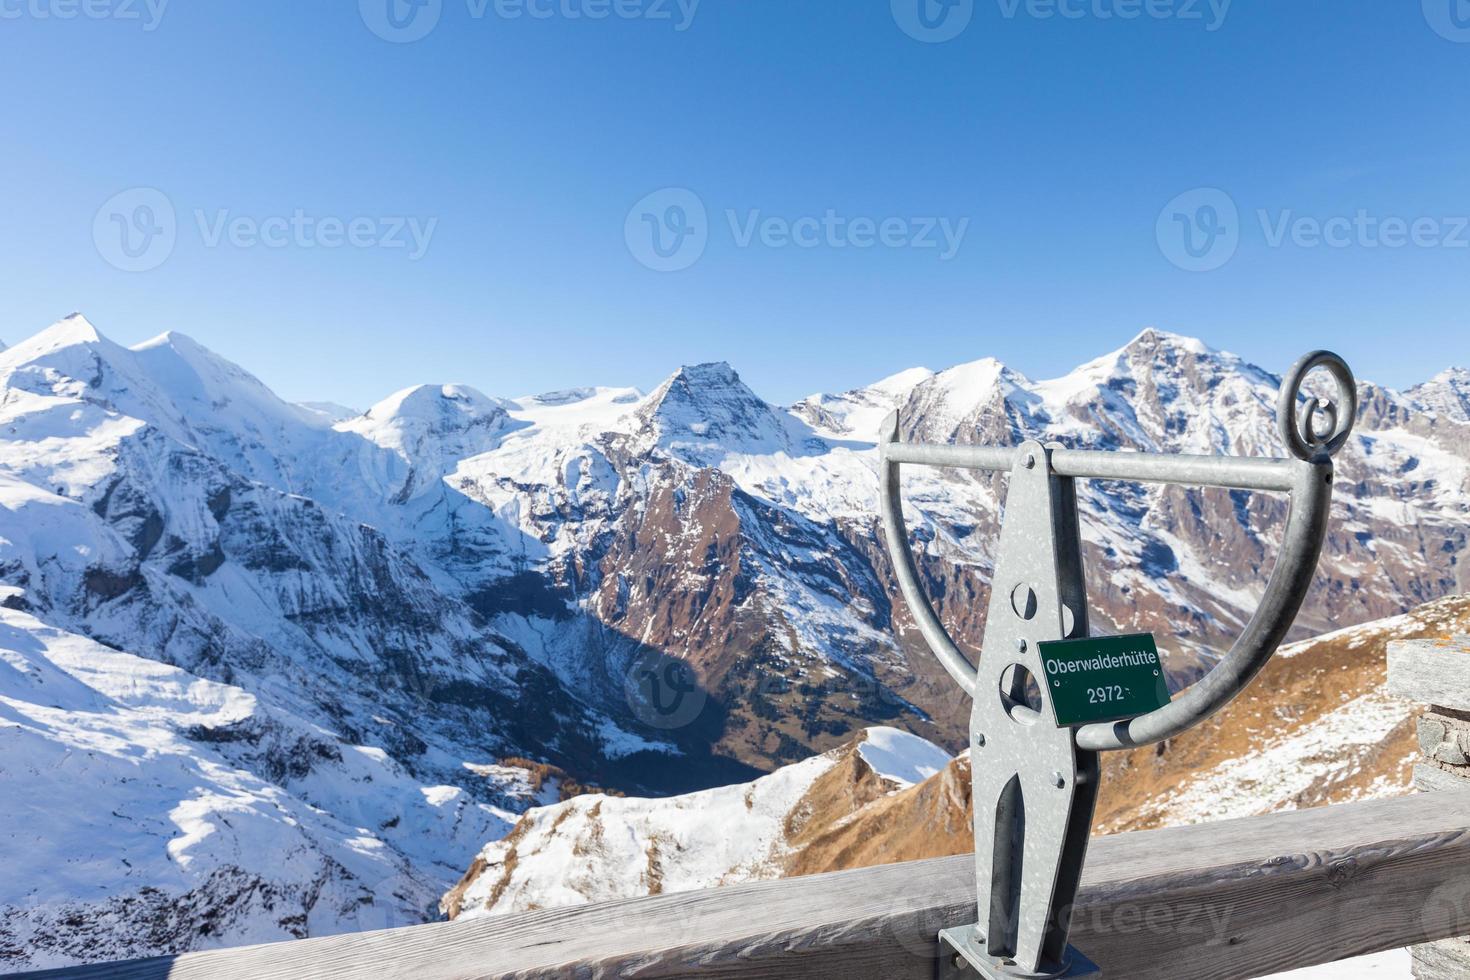 Cadastre-se na montanha grossglockner na Áustria. foto